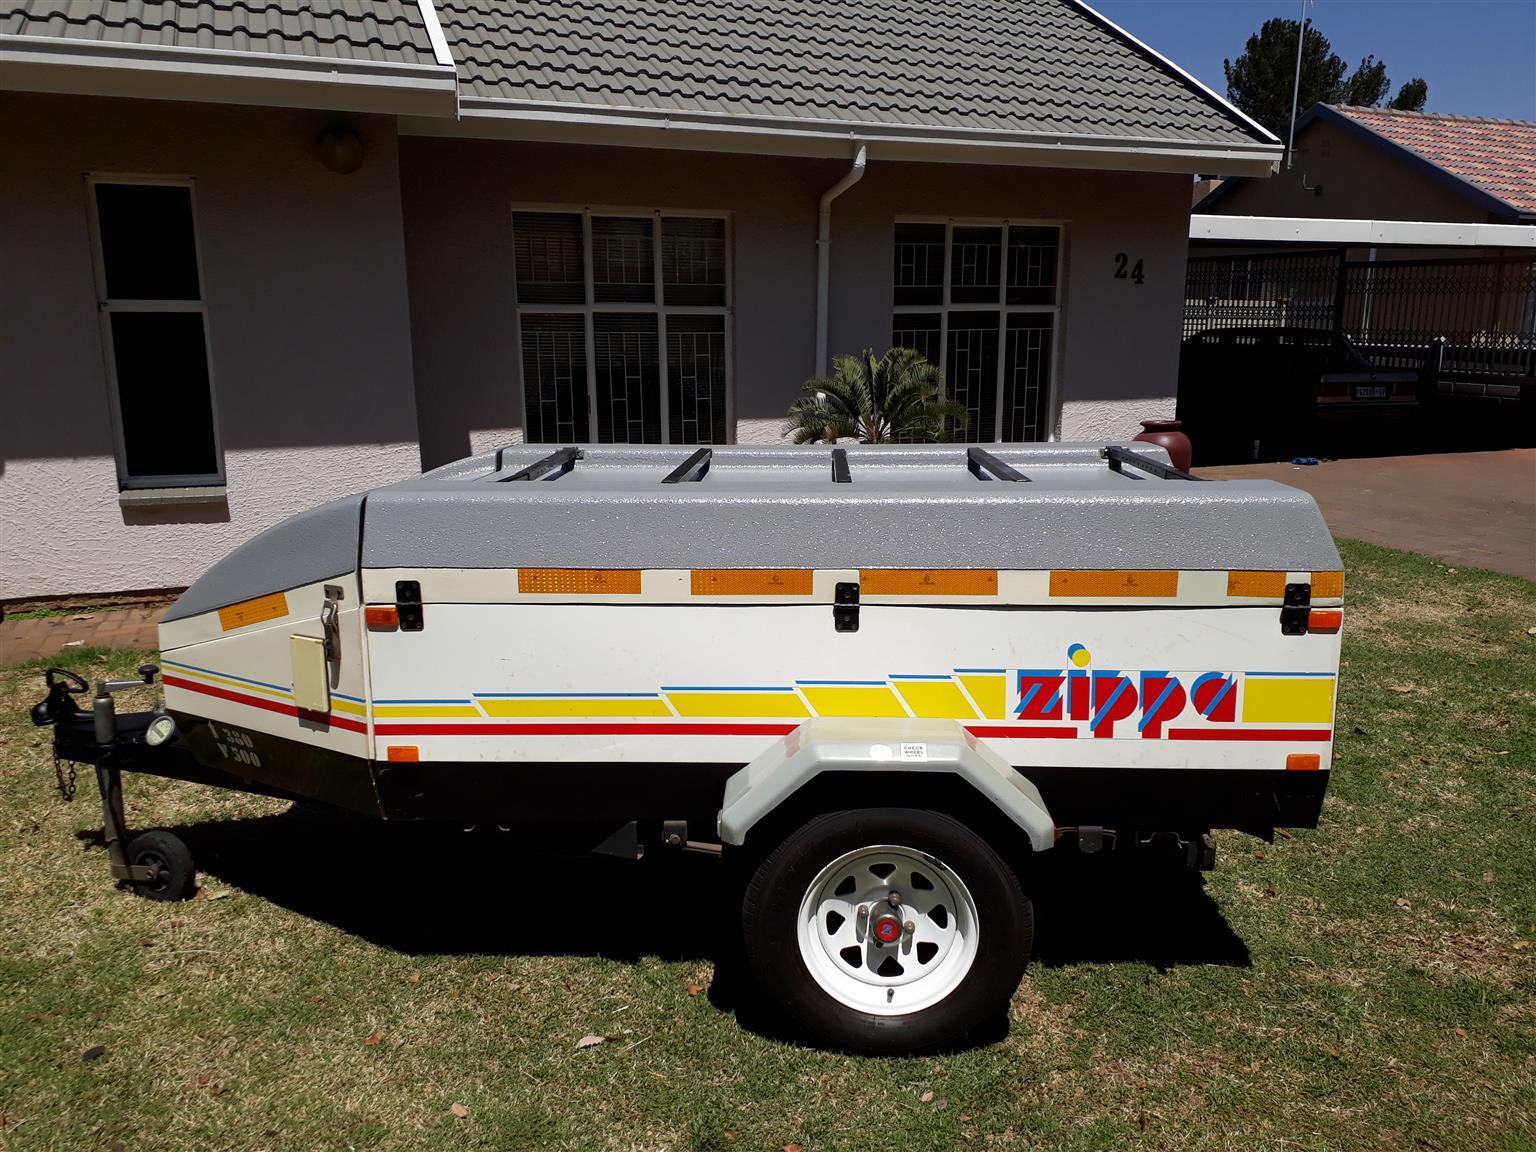 Zippa caravan trailer